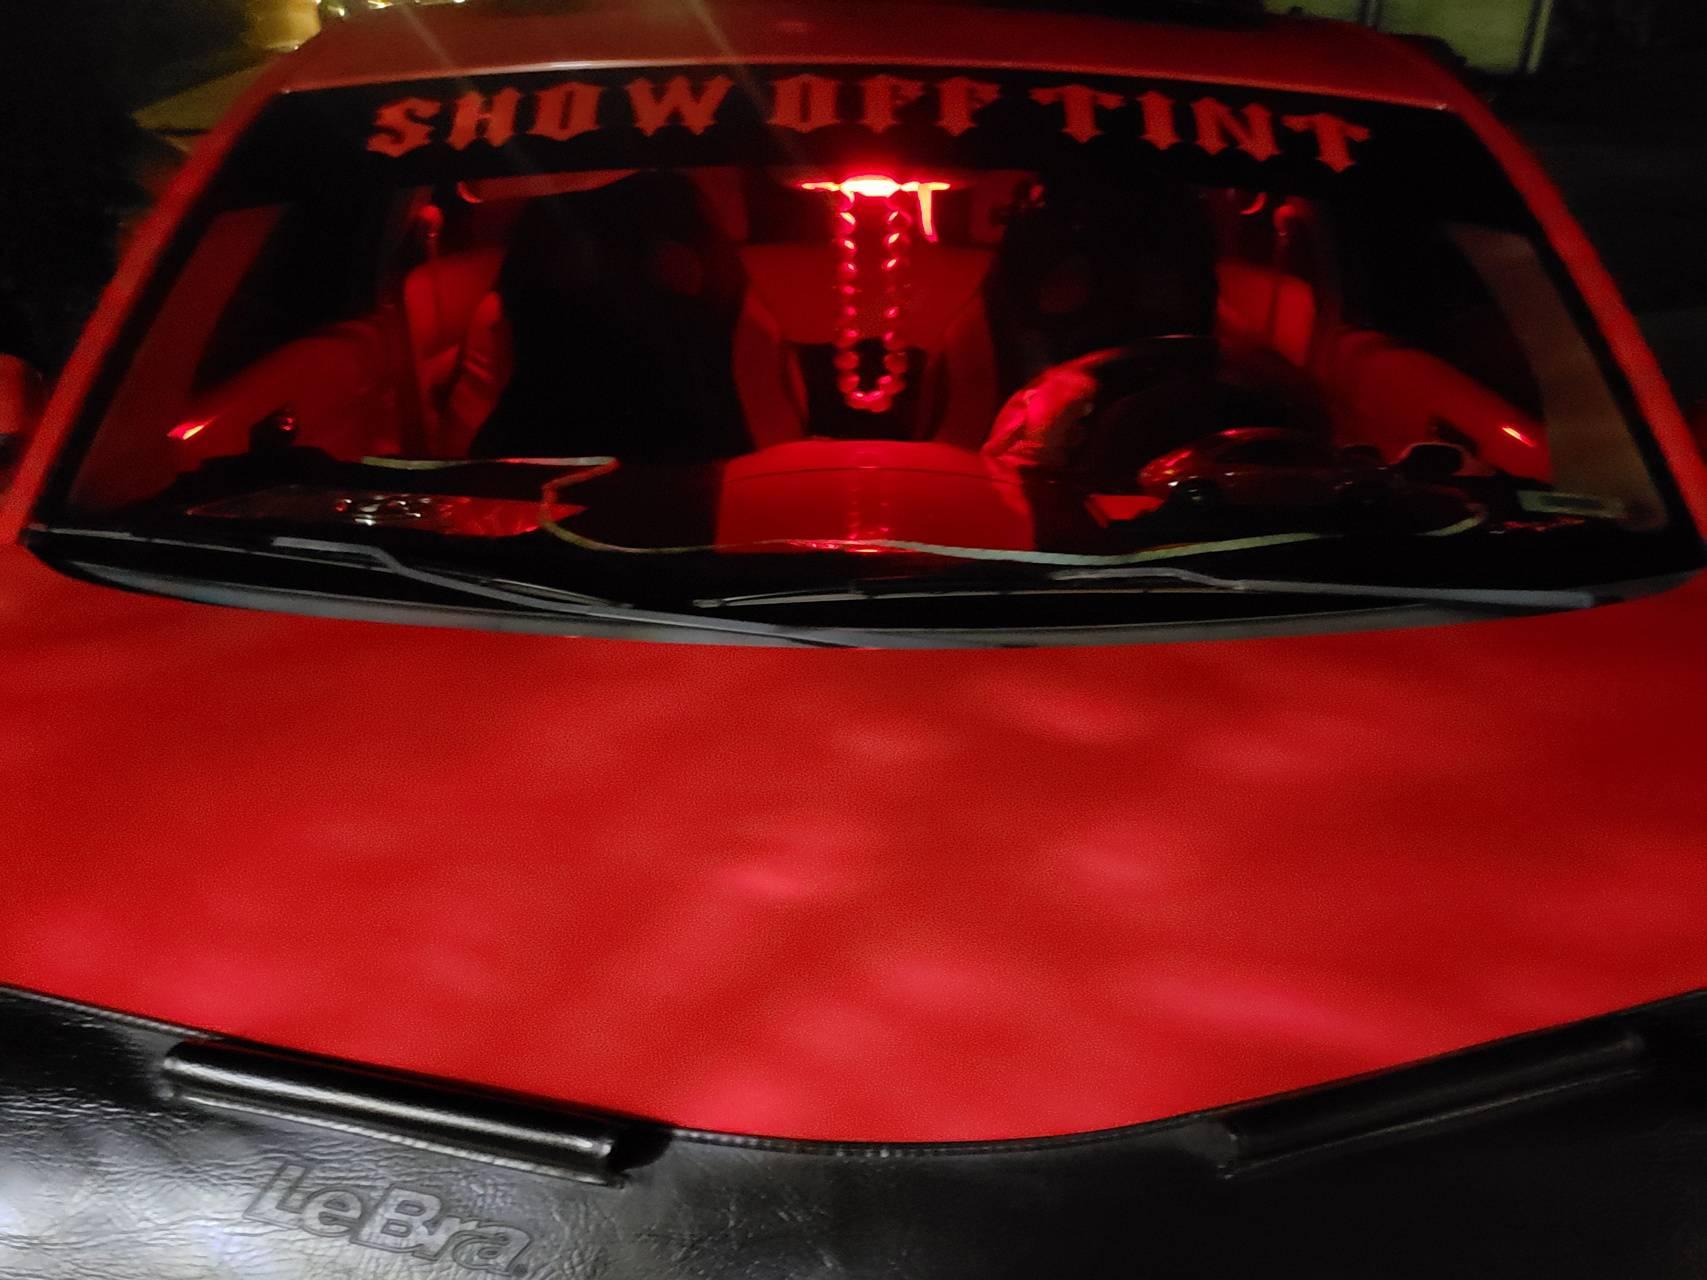 SHOW-OFF-TINT